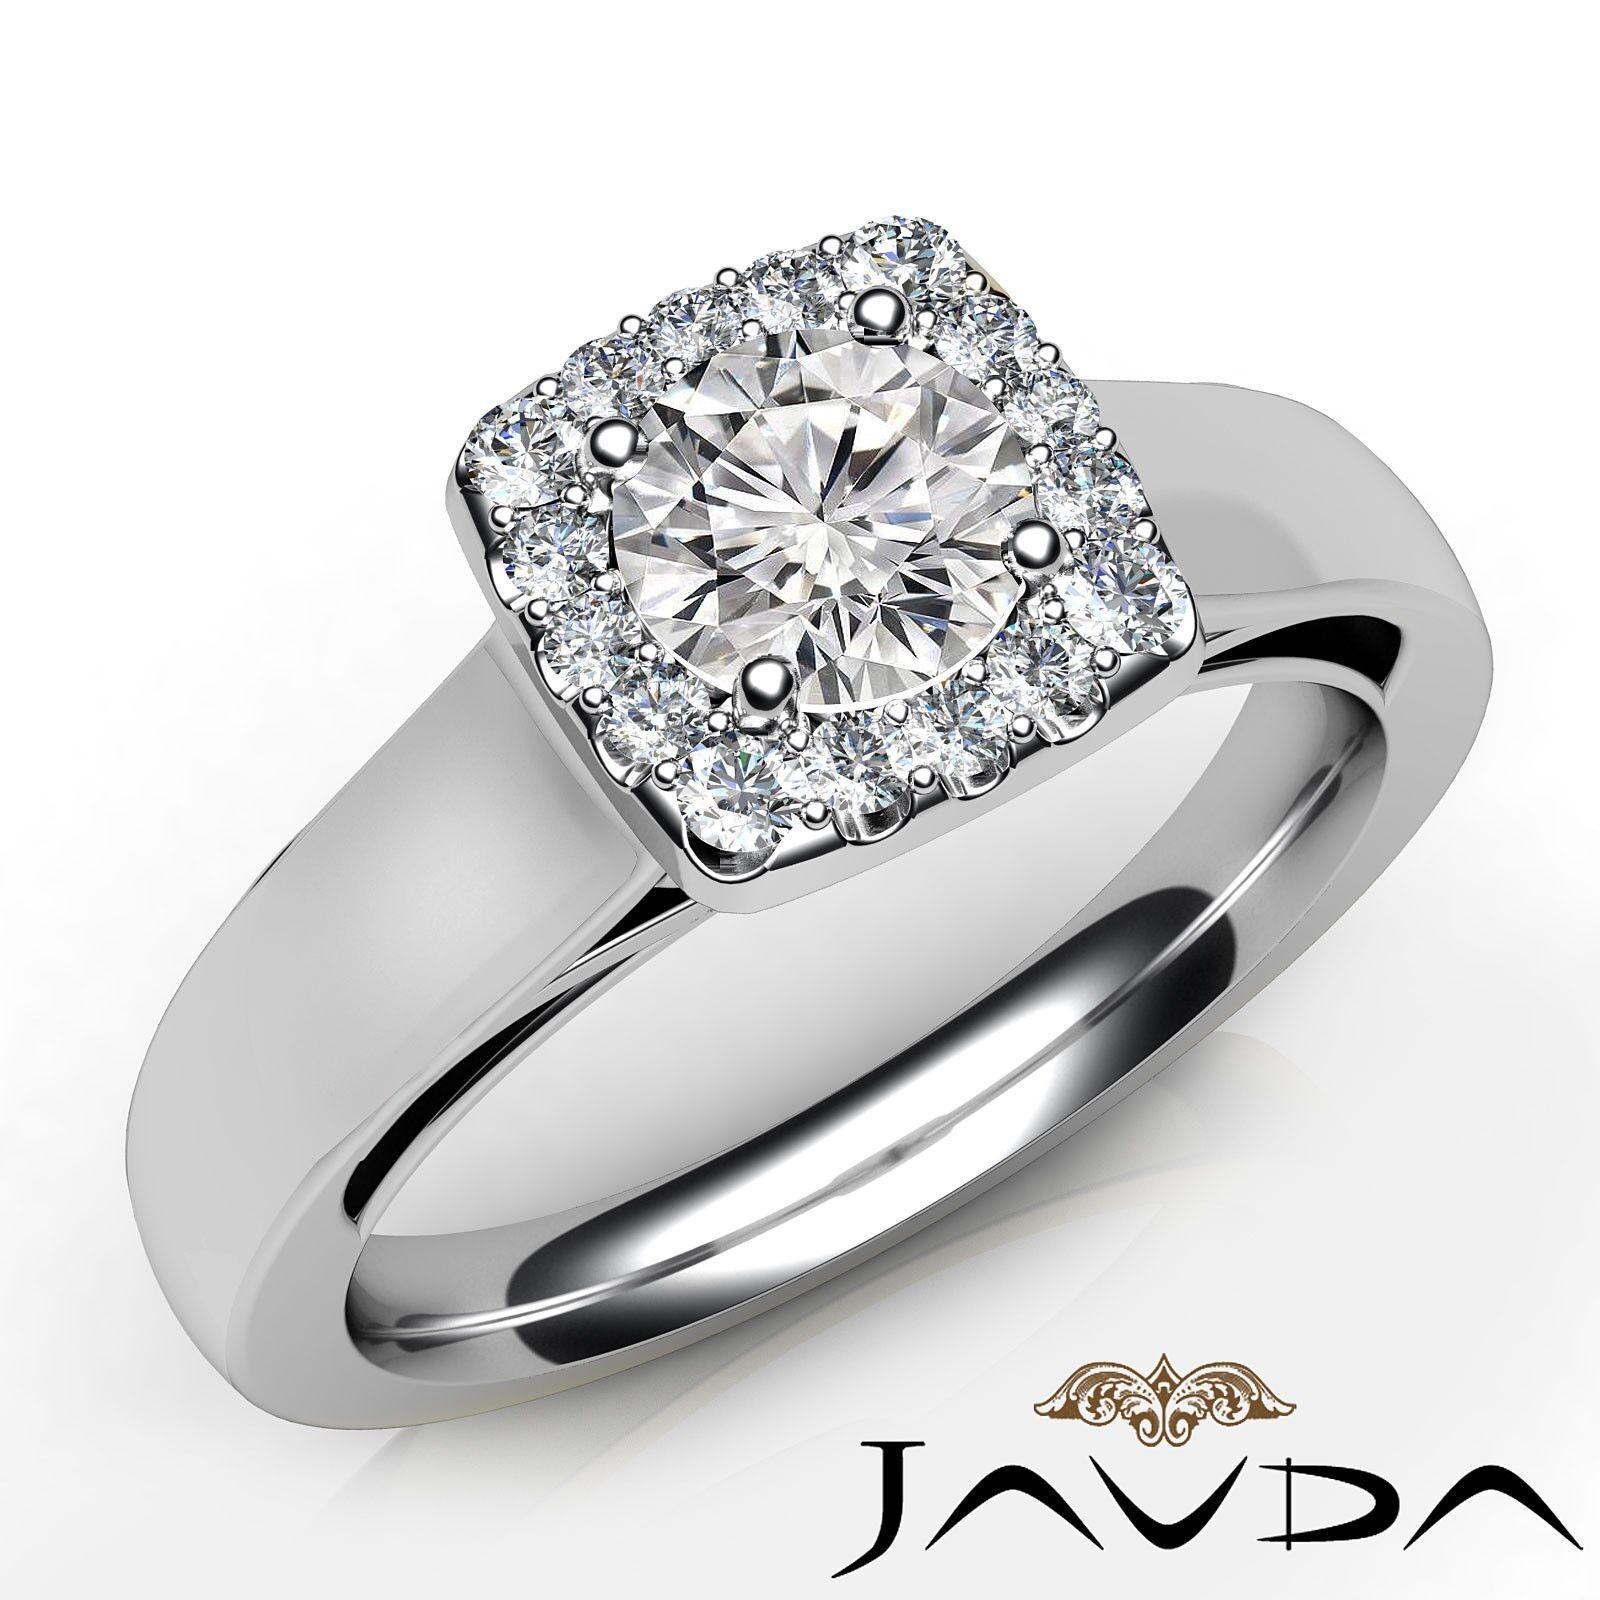 Halo Filigree Shank Prong Setting Round Diamond Engagement Ring GIA E SI1 0.7Ct